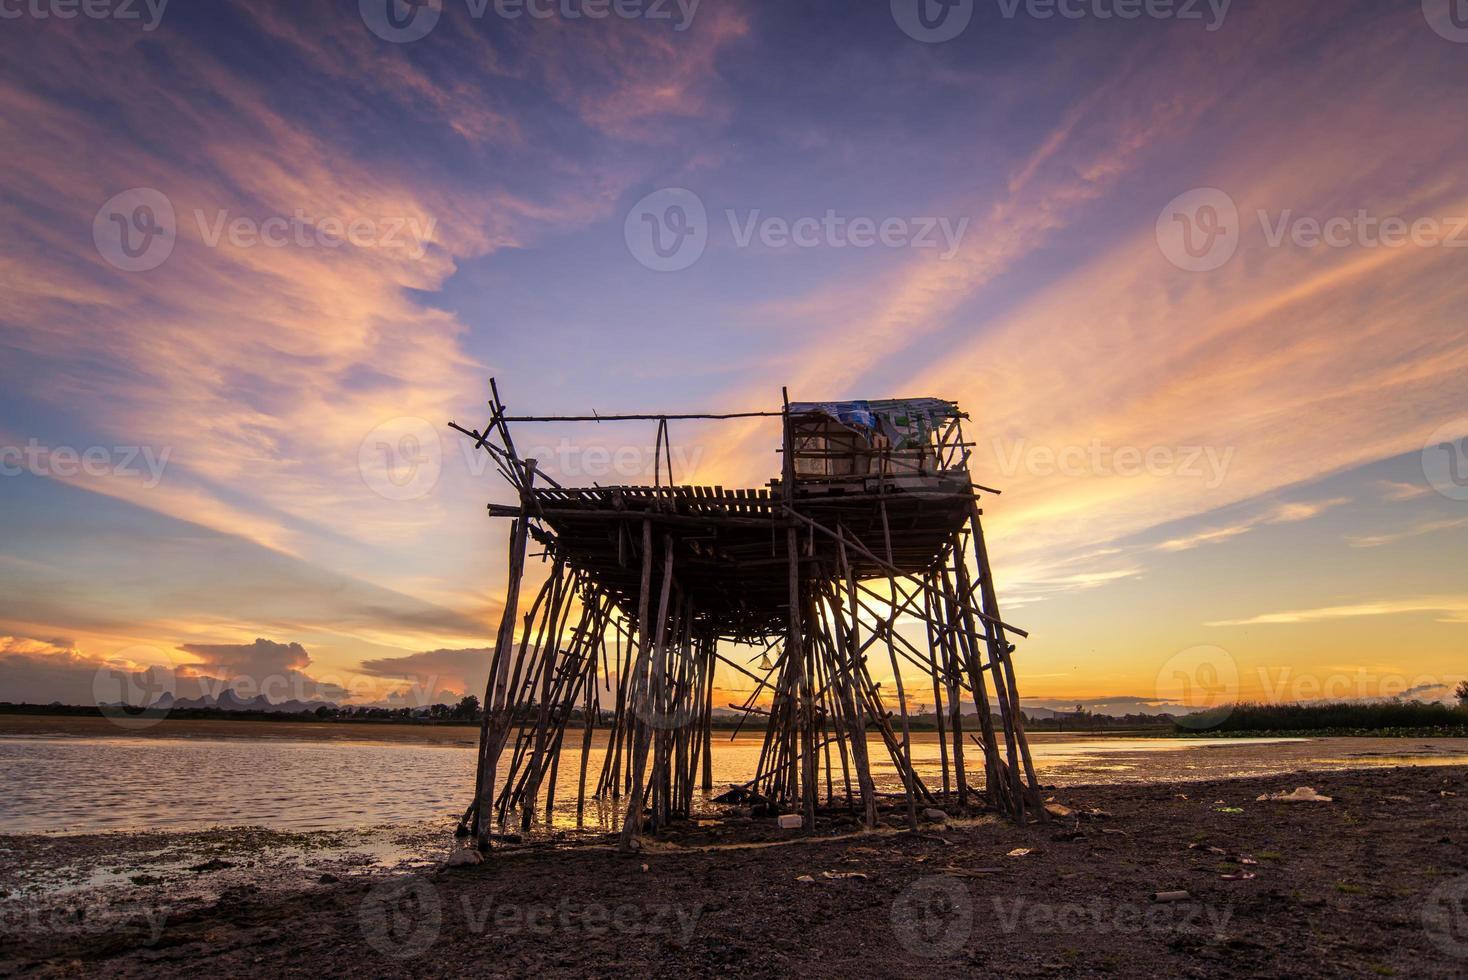 verlaat houten vissershut in mooie zonsondergangscène foto